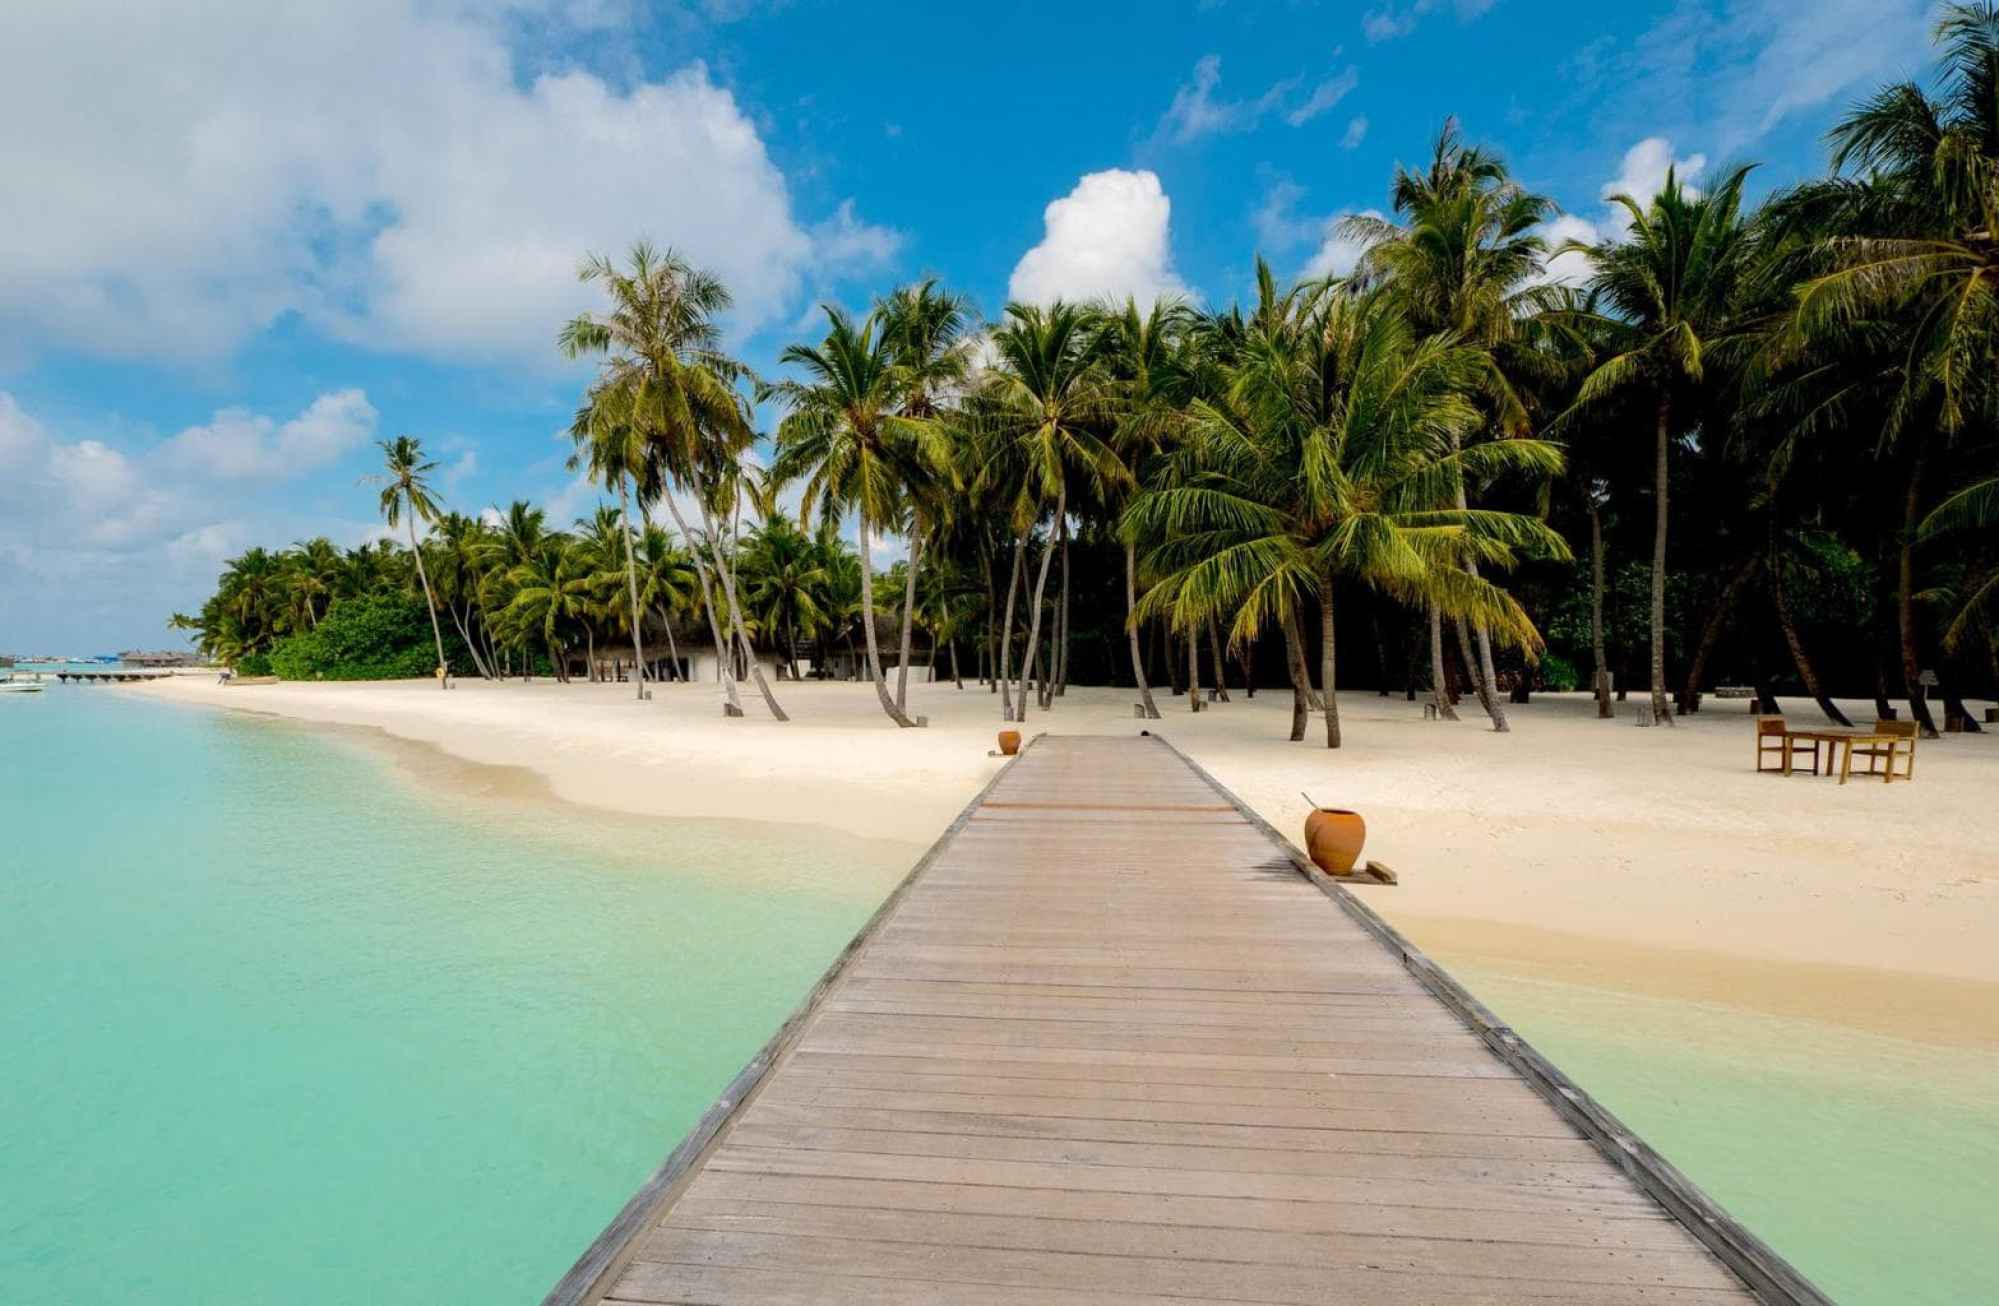 The beach at Gili Lankanfushi